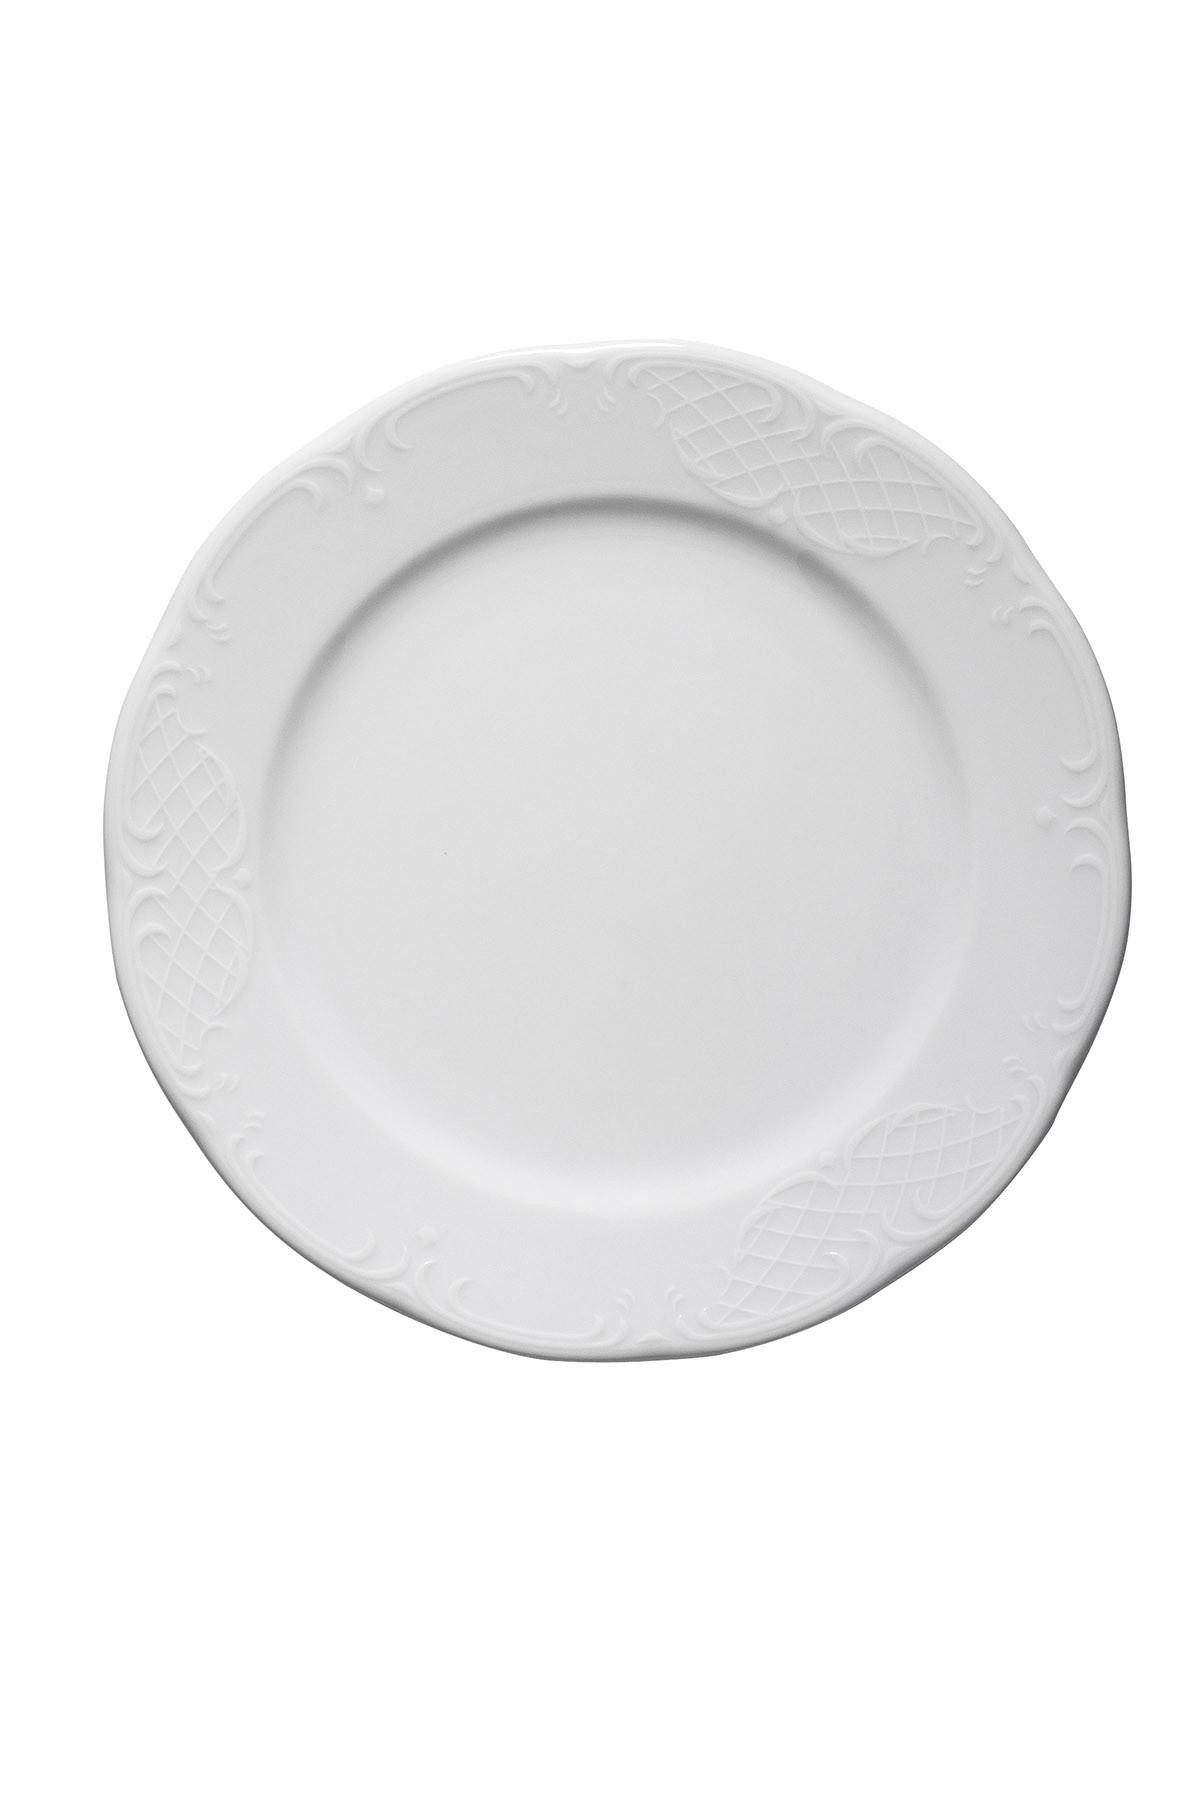 Kütahya Porselen